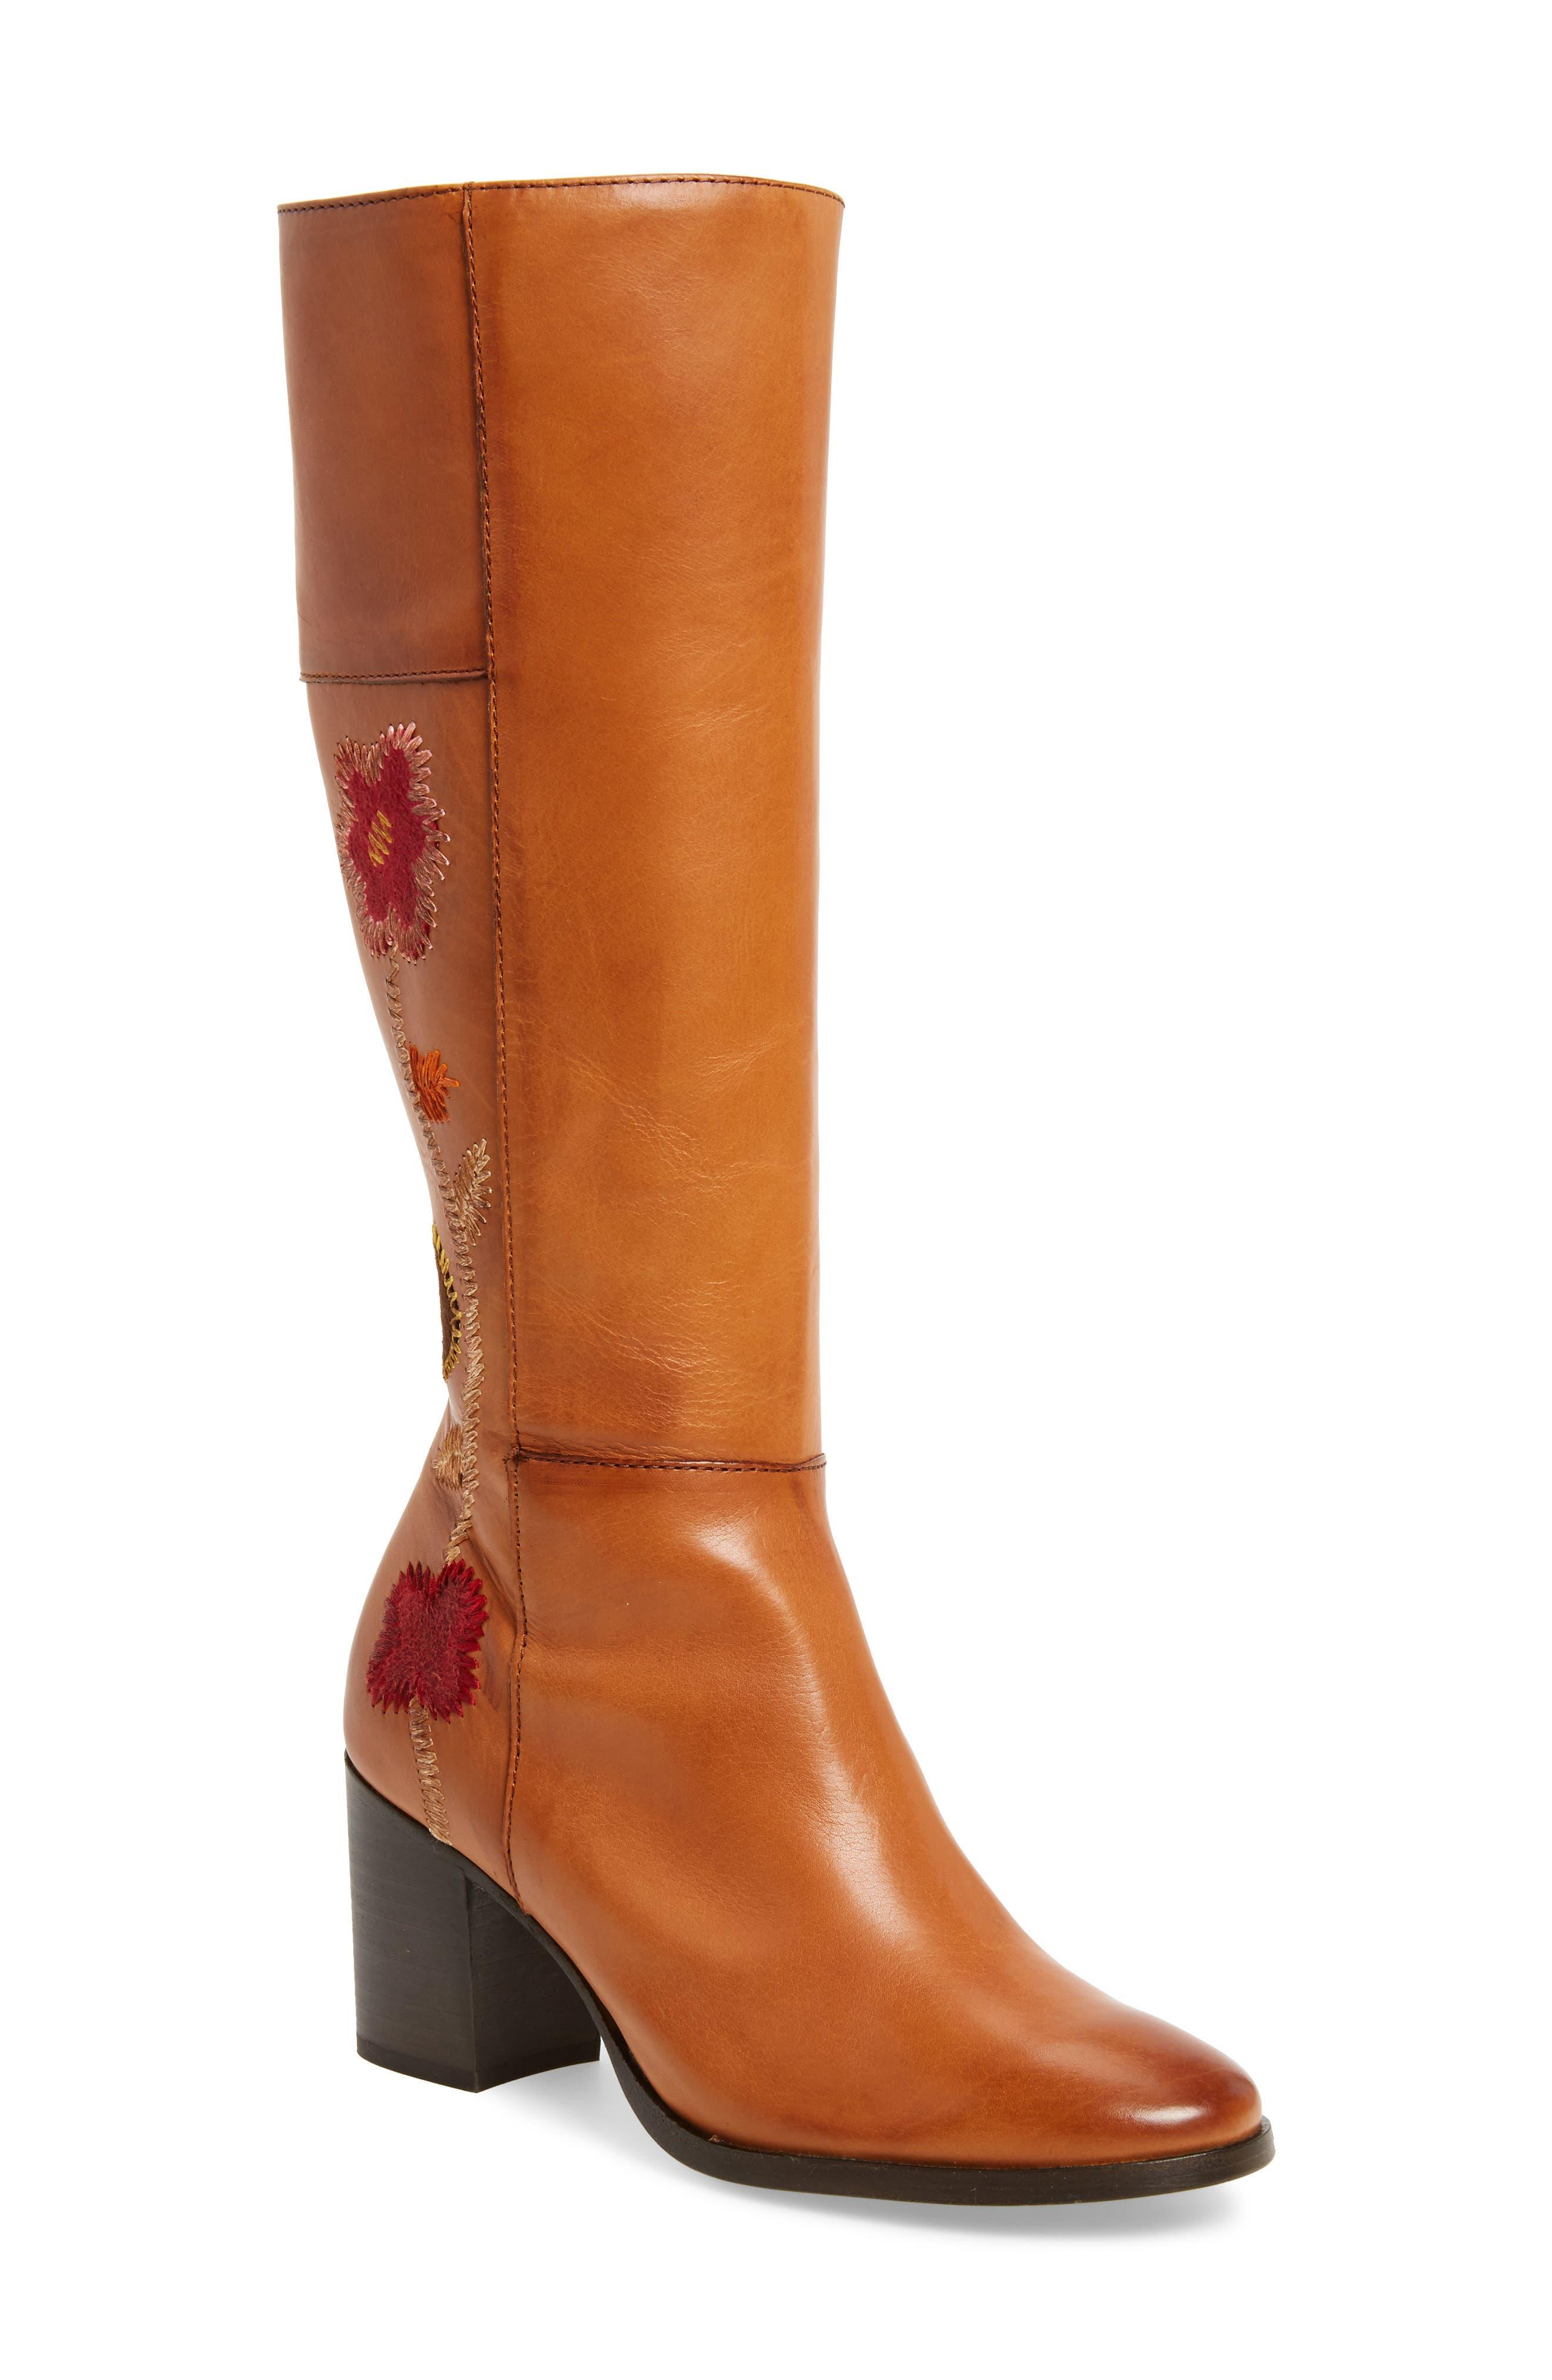 Alternate Image 1 Selected - Frye Nova Floral Embroidered Knee High Boot (Women)